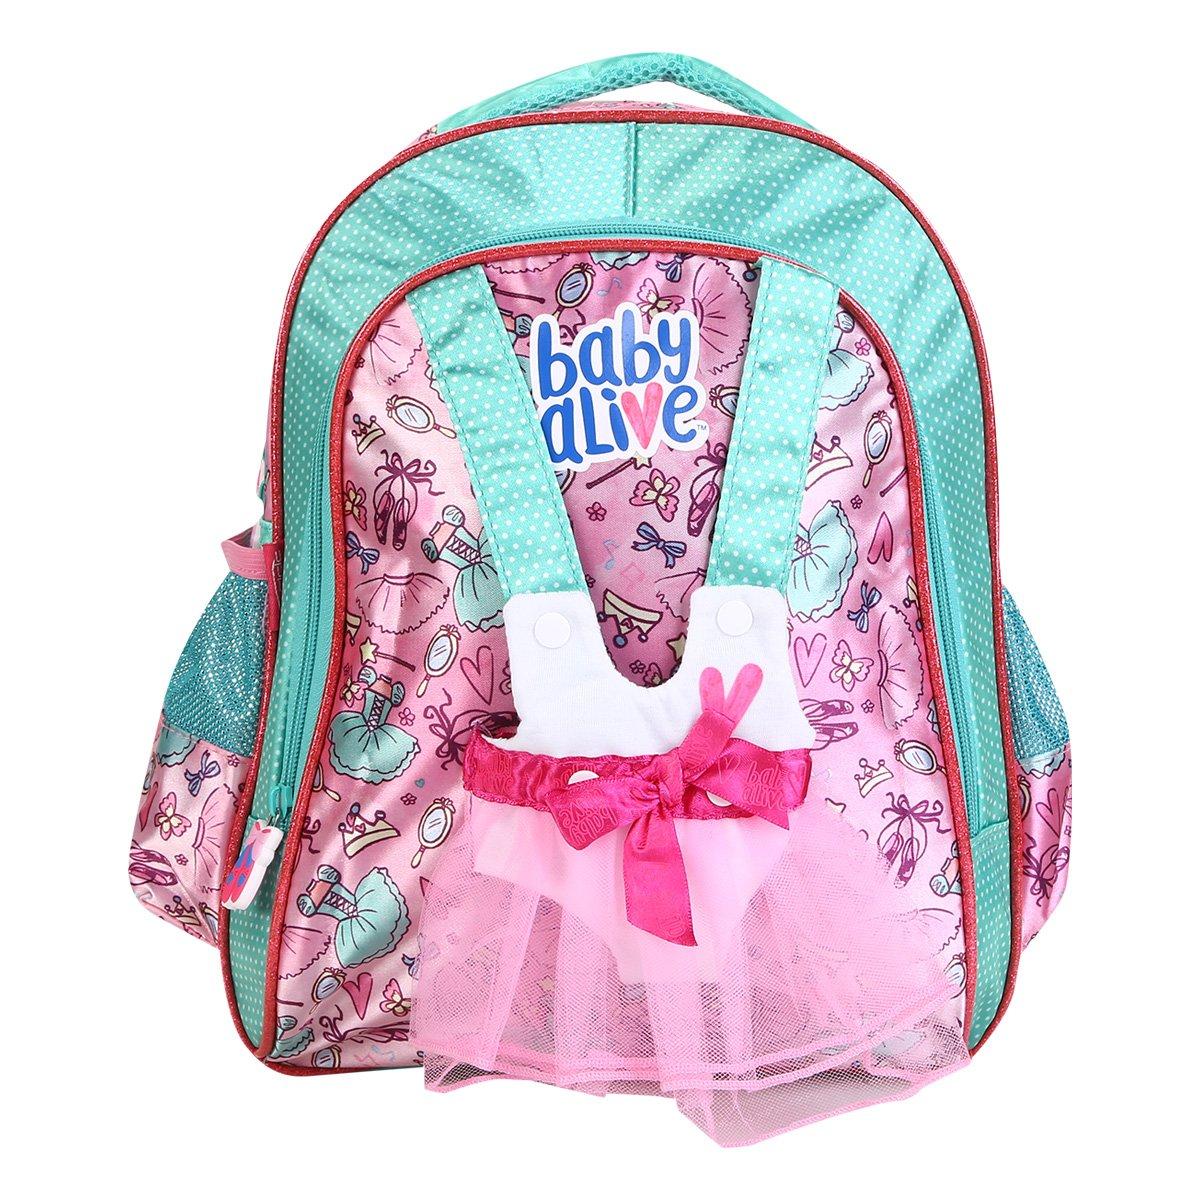 261f53b84 FornecedorNetshoes. Mochila Infantil Escolar Pacific Baby Alive-980A05